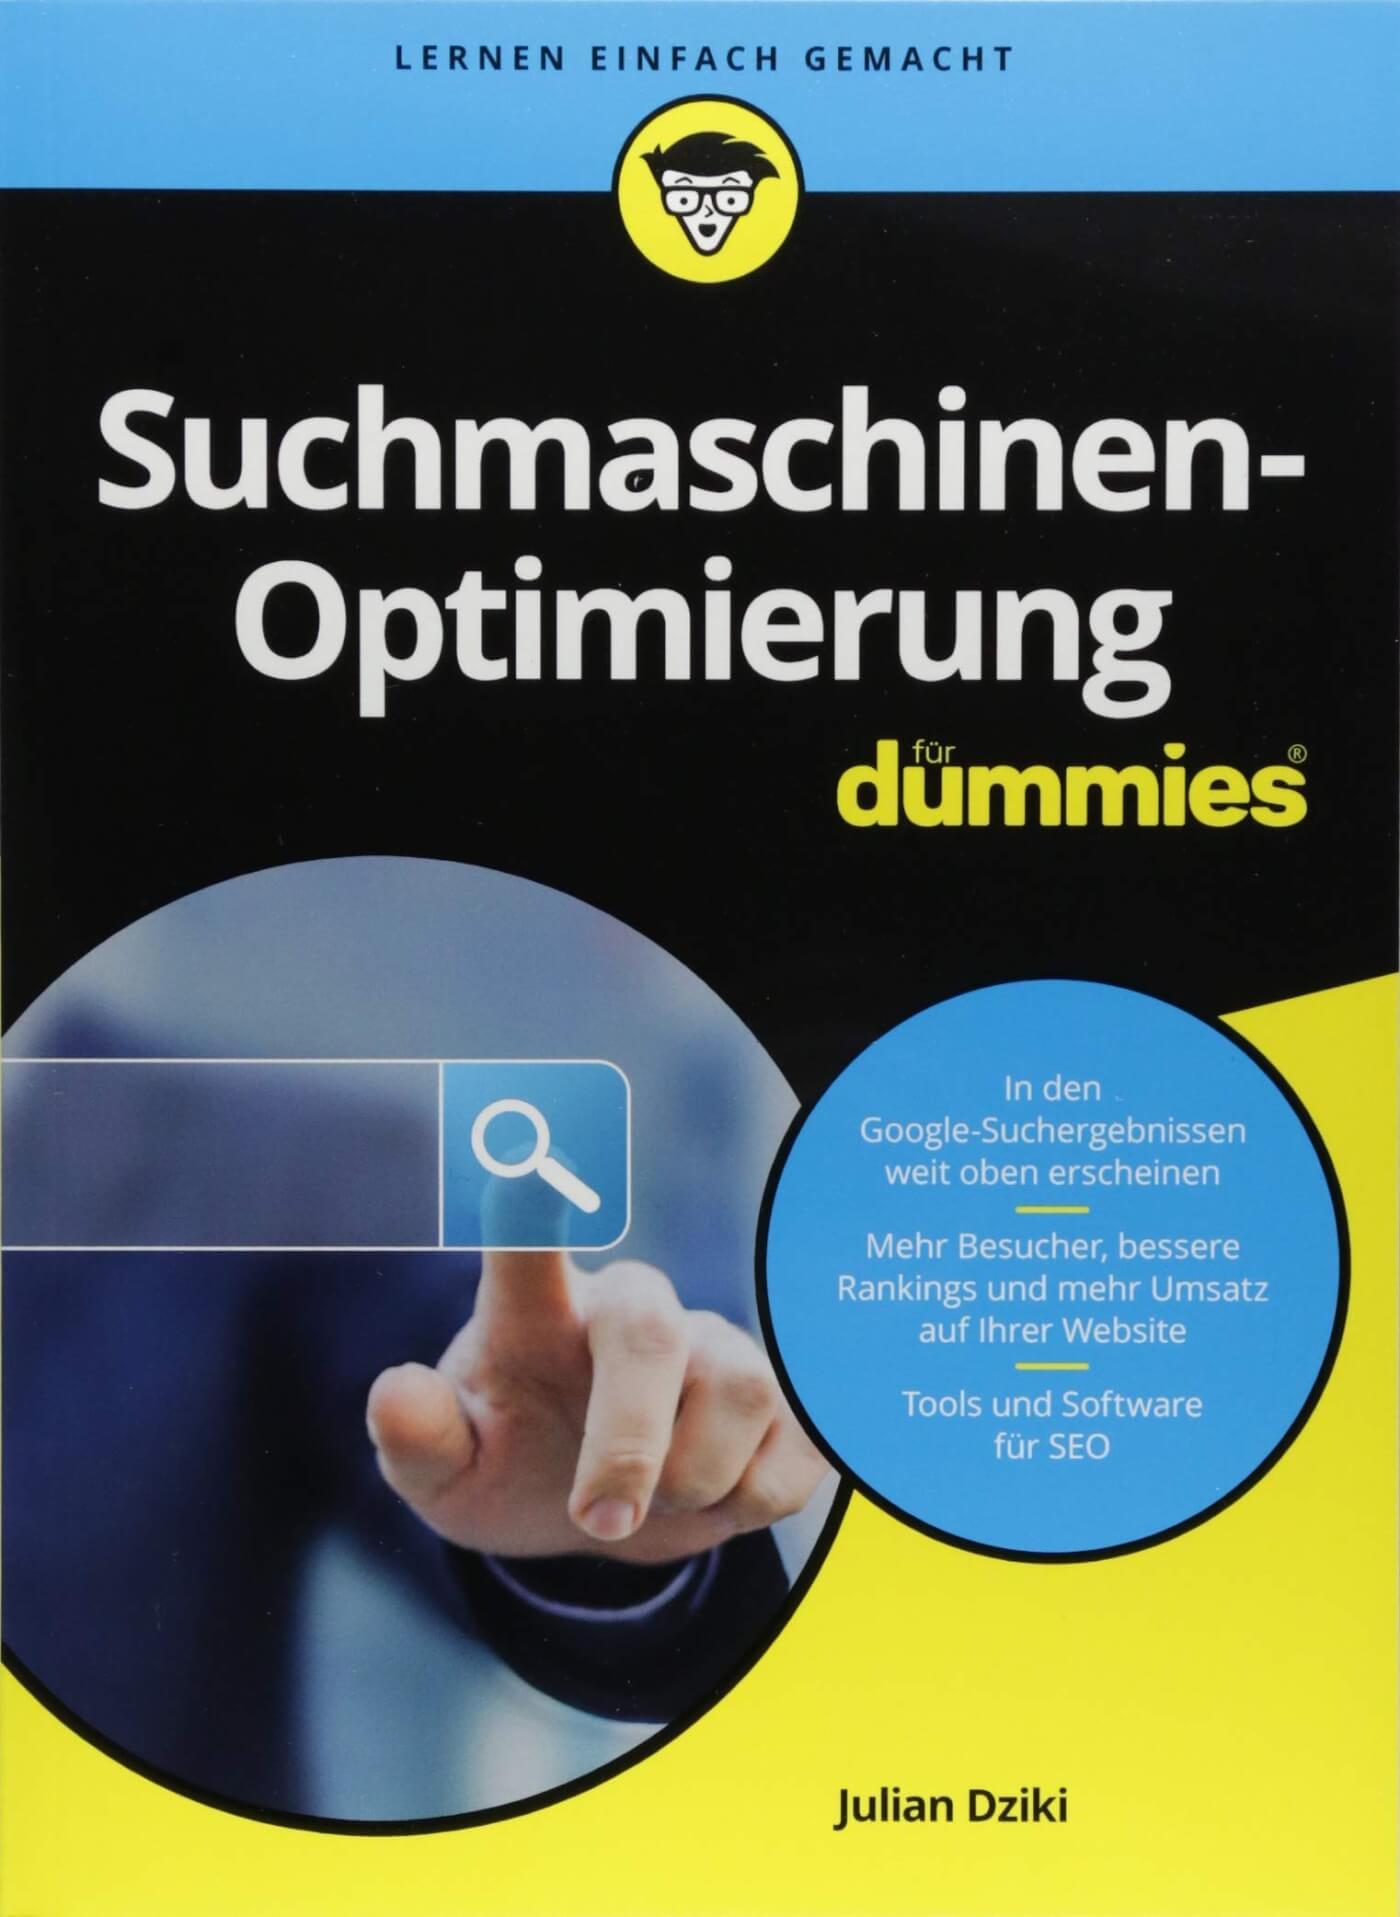 Buchtipp: Suchmaschinen-Optimierung